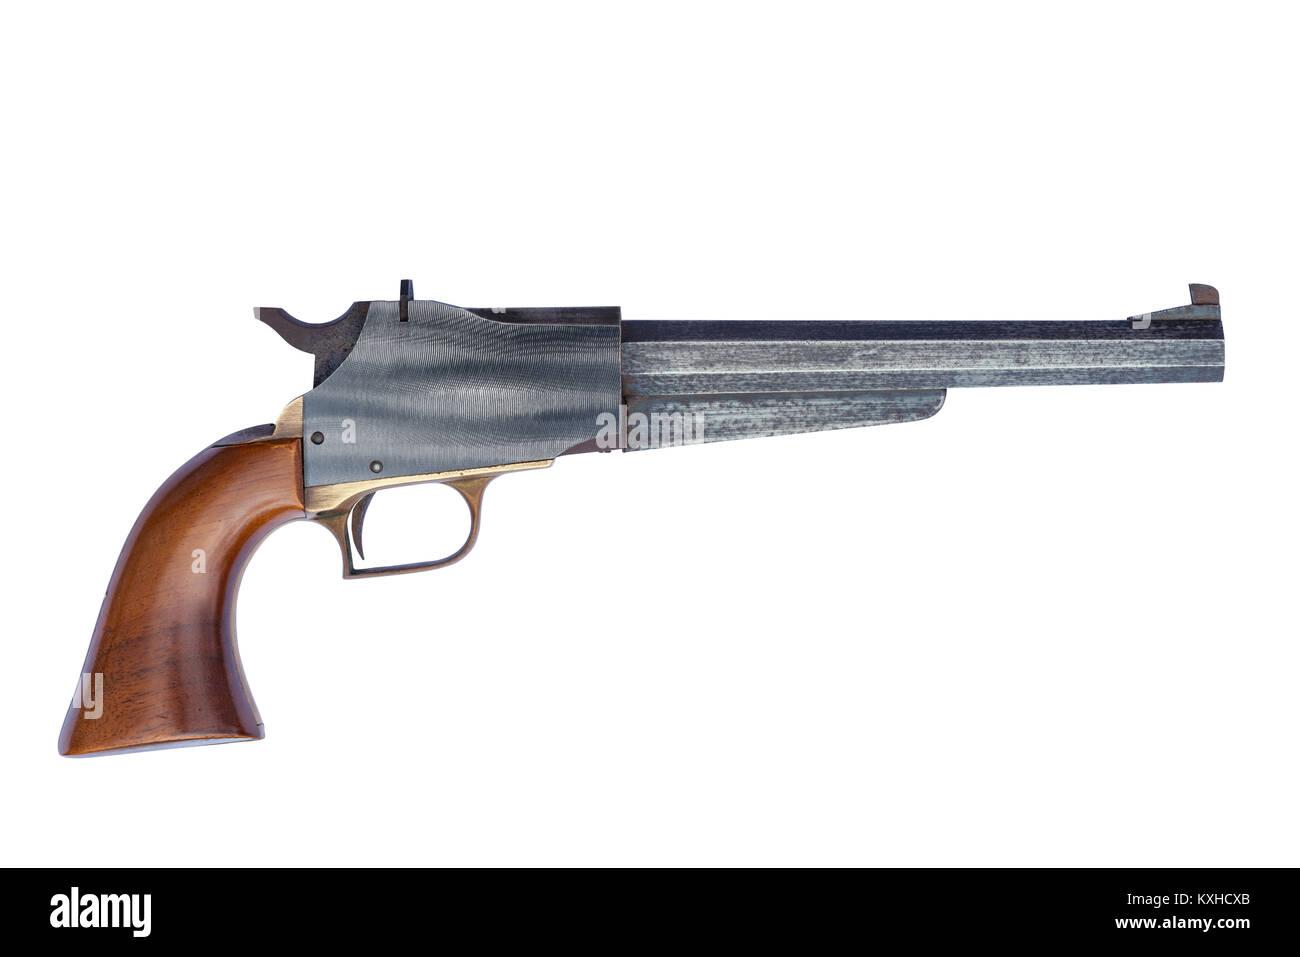 black powder muzzle loader pistol Stock Photo: 171257699 - Alamy